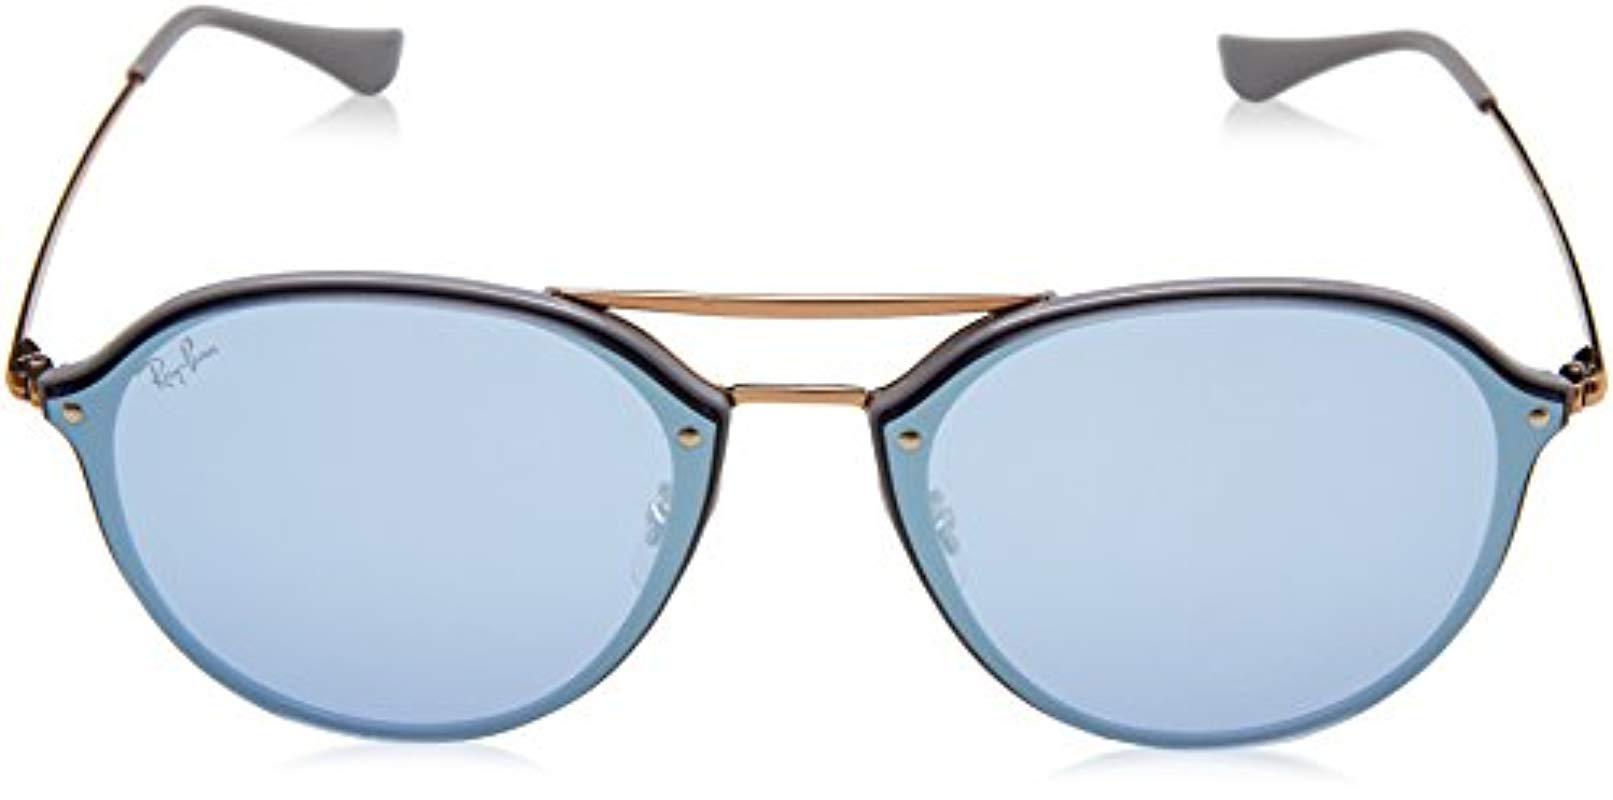 29ffec3cf18 Ray-Ban Blaze Double Bridge Rimless Sunglasses In Light Grey Blue ...